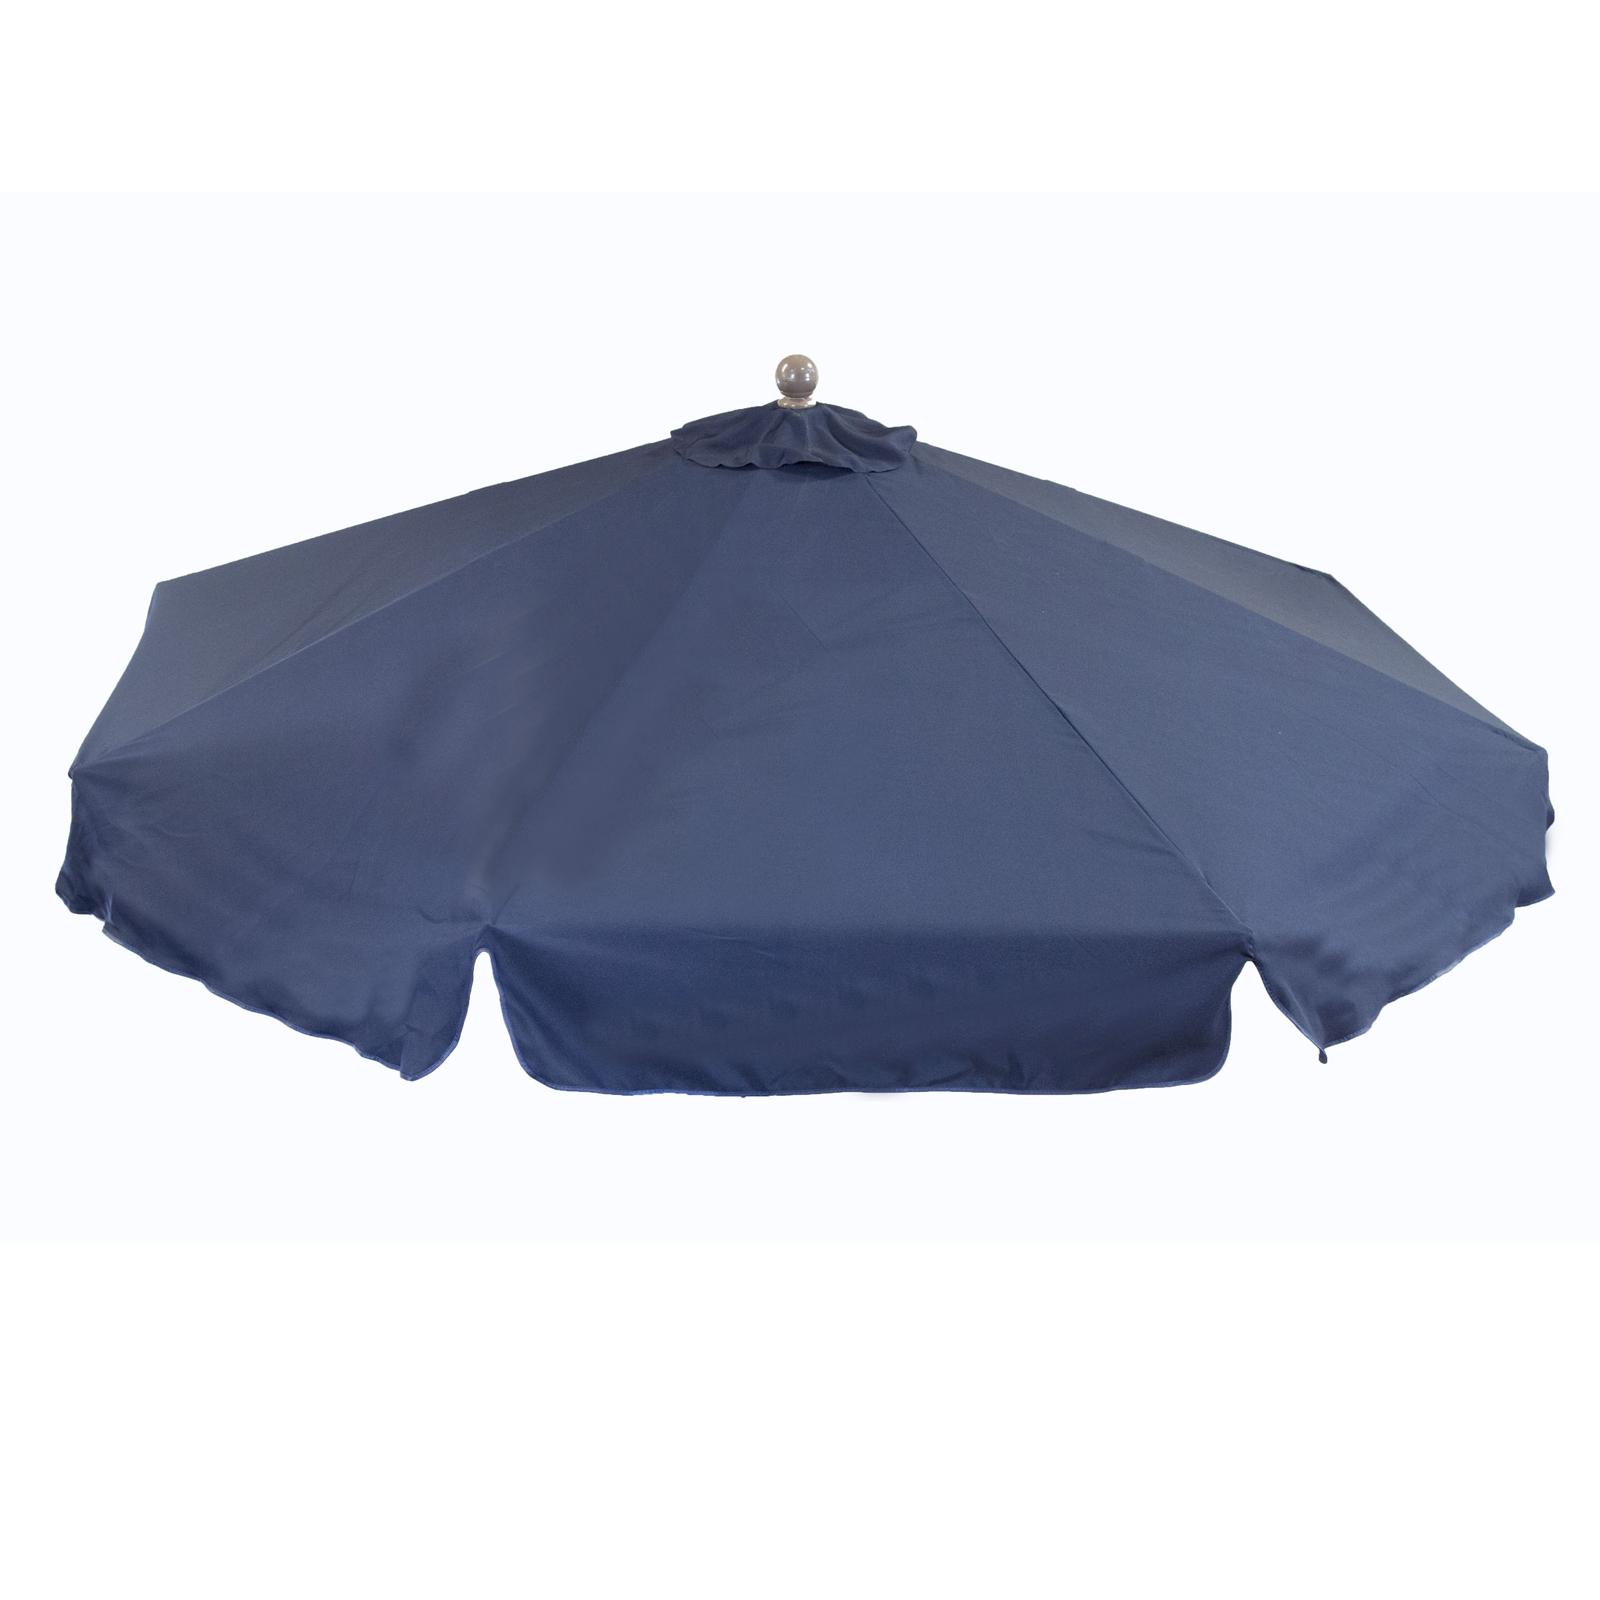 Newest 9Ft Tilt Italian Market Umbrella Home Patio Outdoor Garden Canopy Shelter –  Navy Inside Italian Market Umbrellas (Gallery 10 of 20)